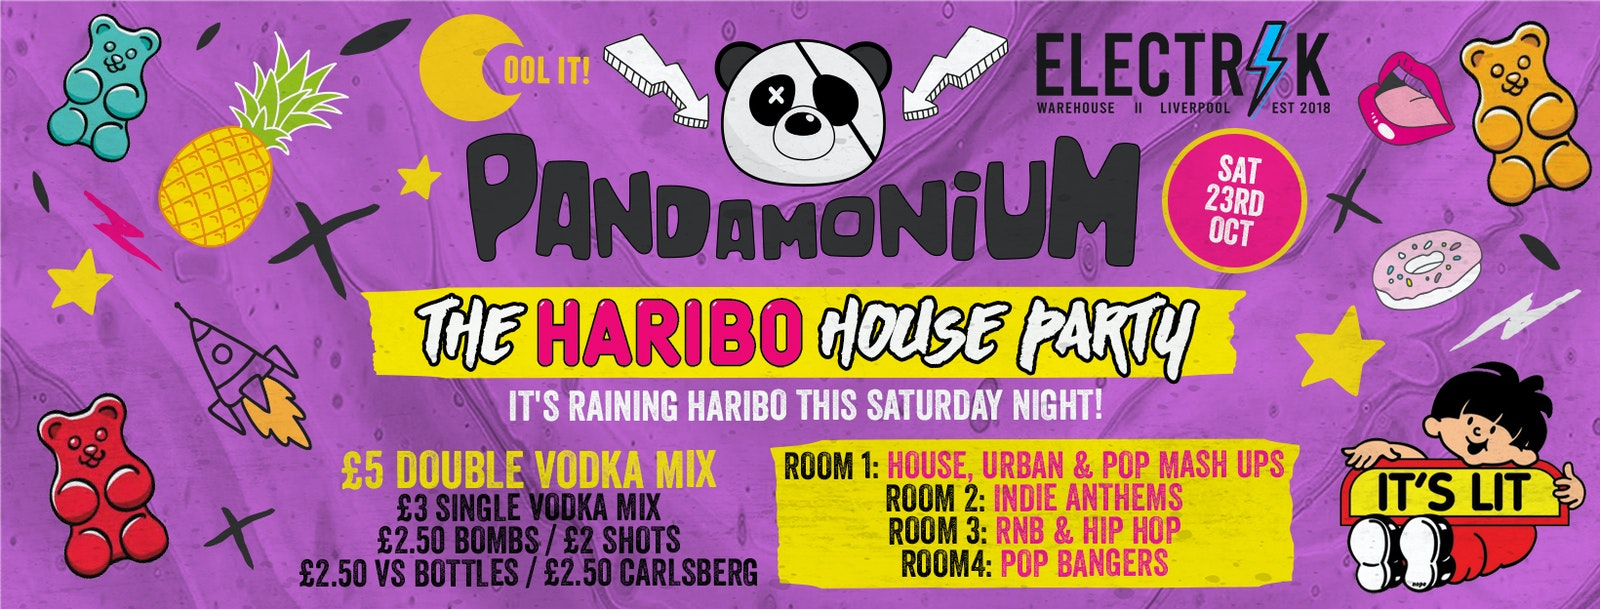 Pandamonium Saturdays : Haribo House Party